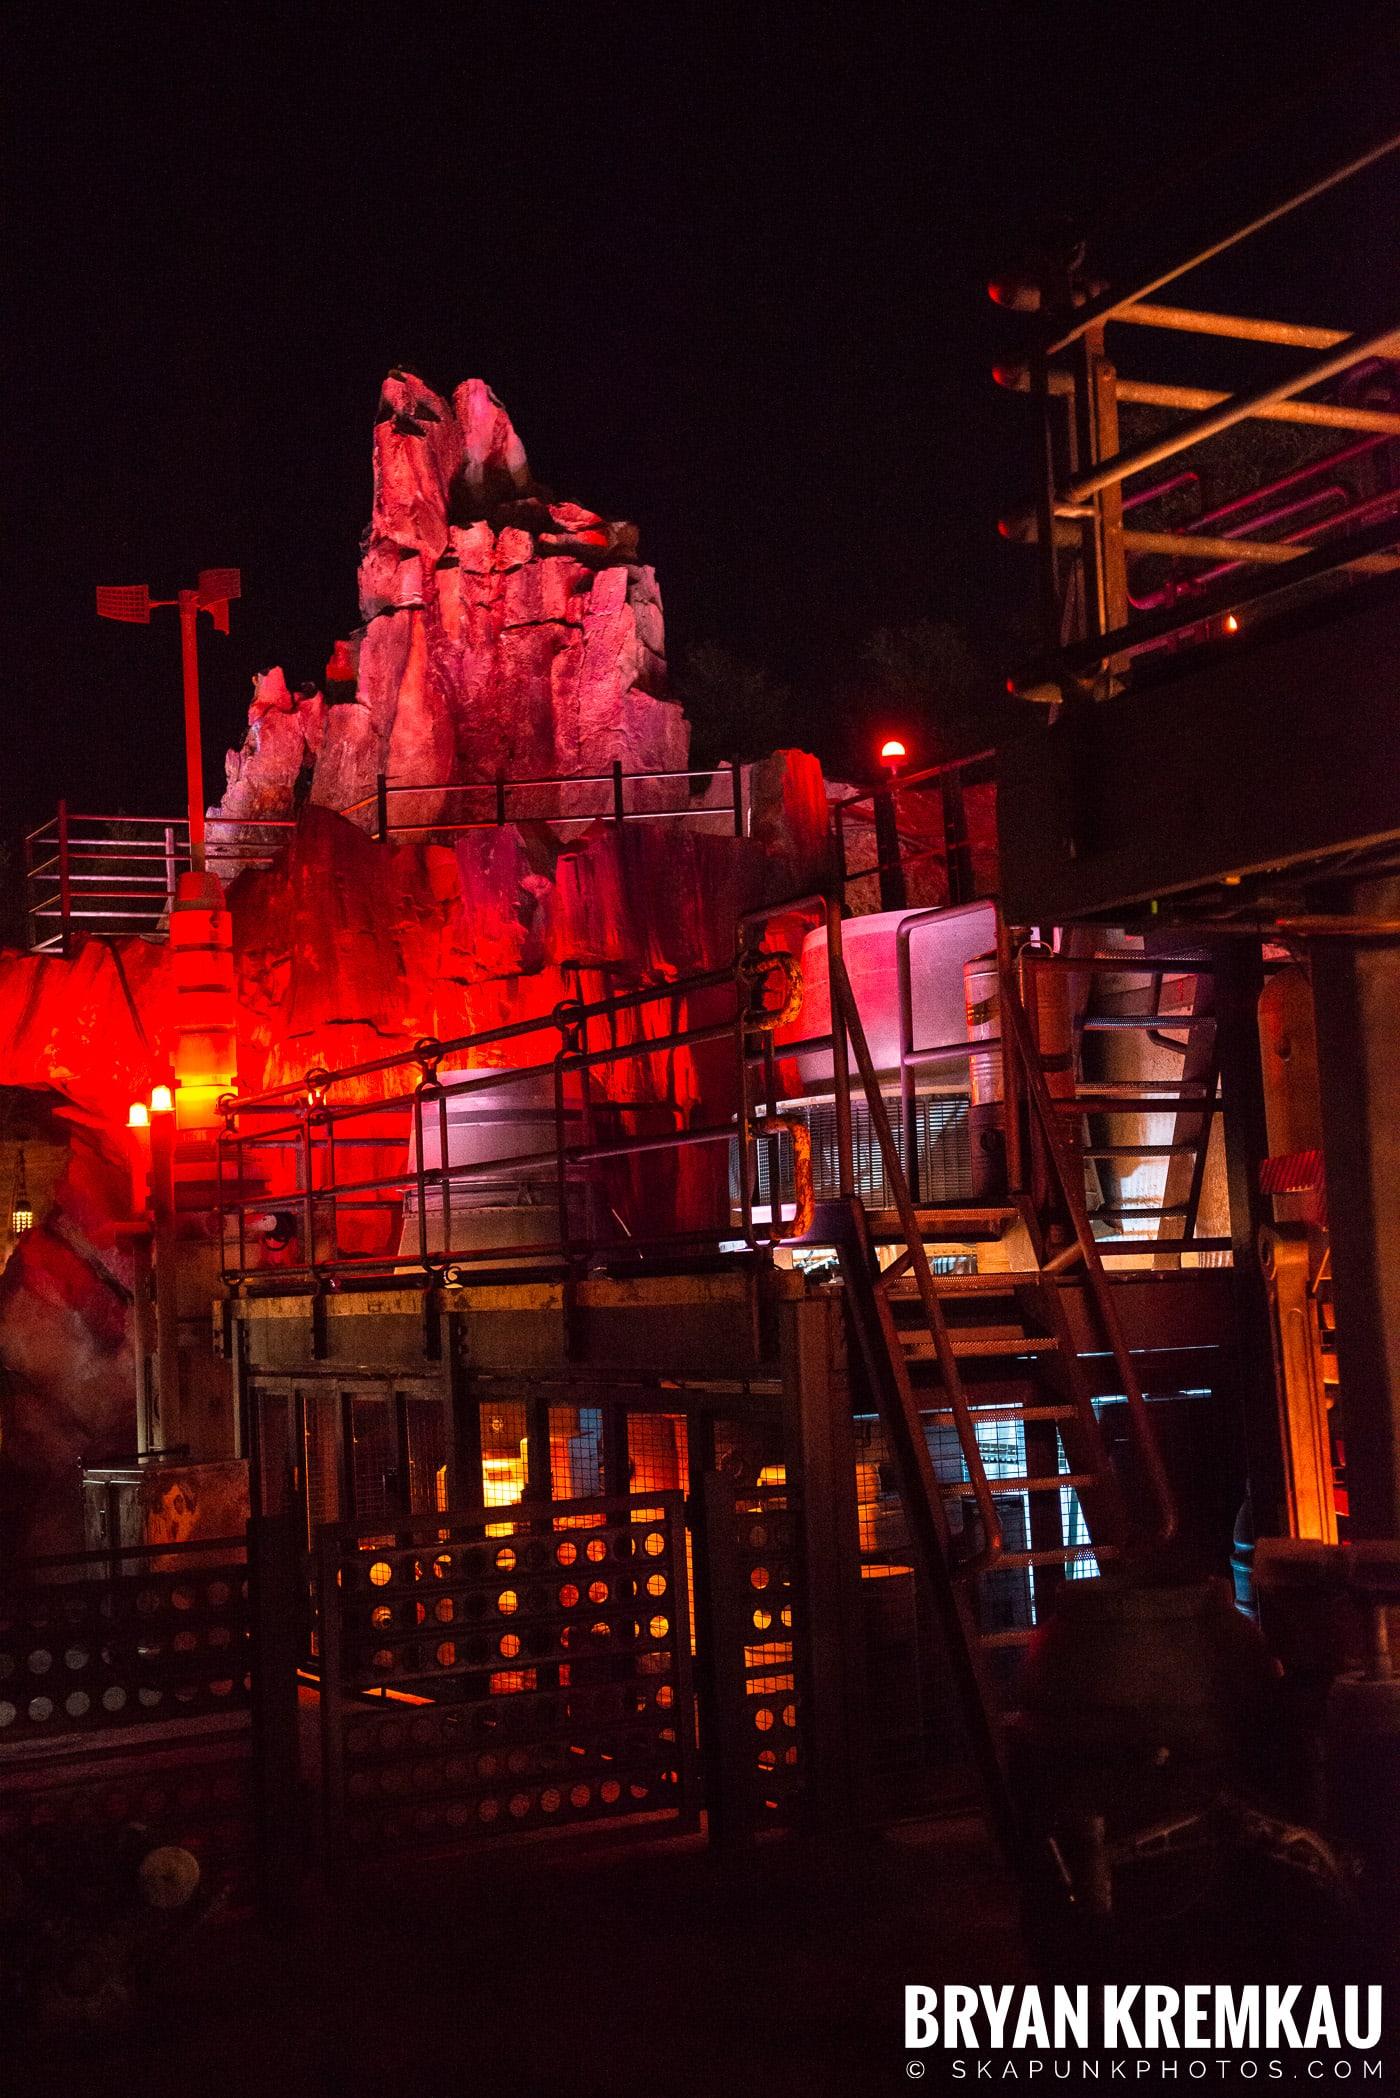 Walt Disney World Vacation: Day 6 (Magic Kingdom, Epcot, Disney's Hollywood Studios) - 10.4.19 (3)